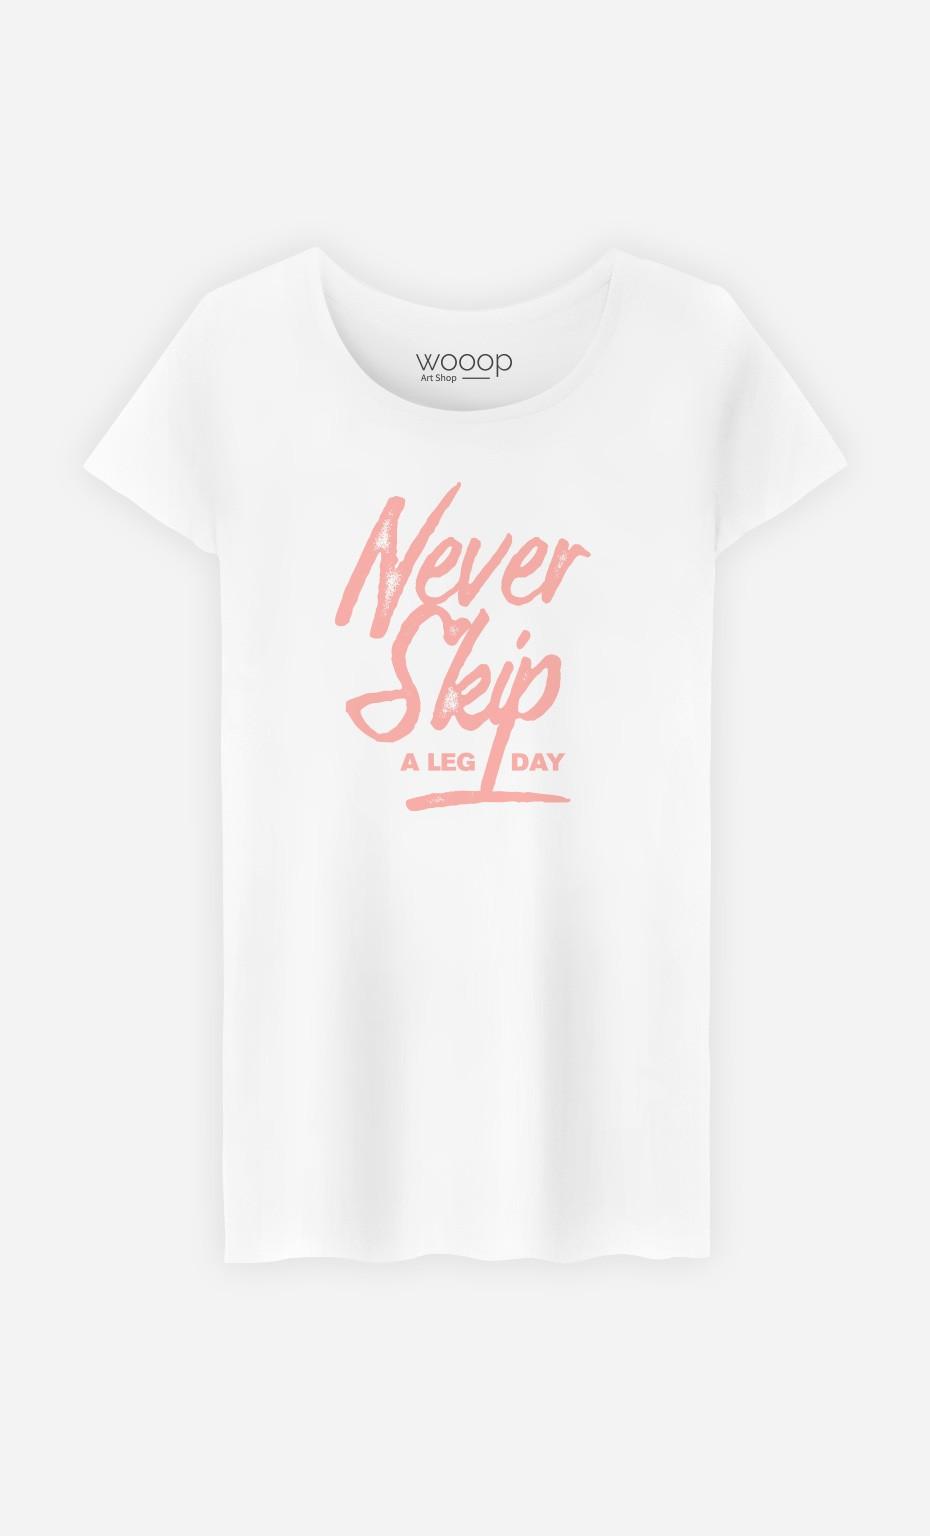 T-Shirt Legday